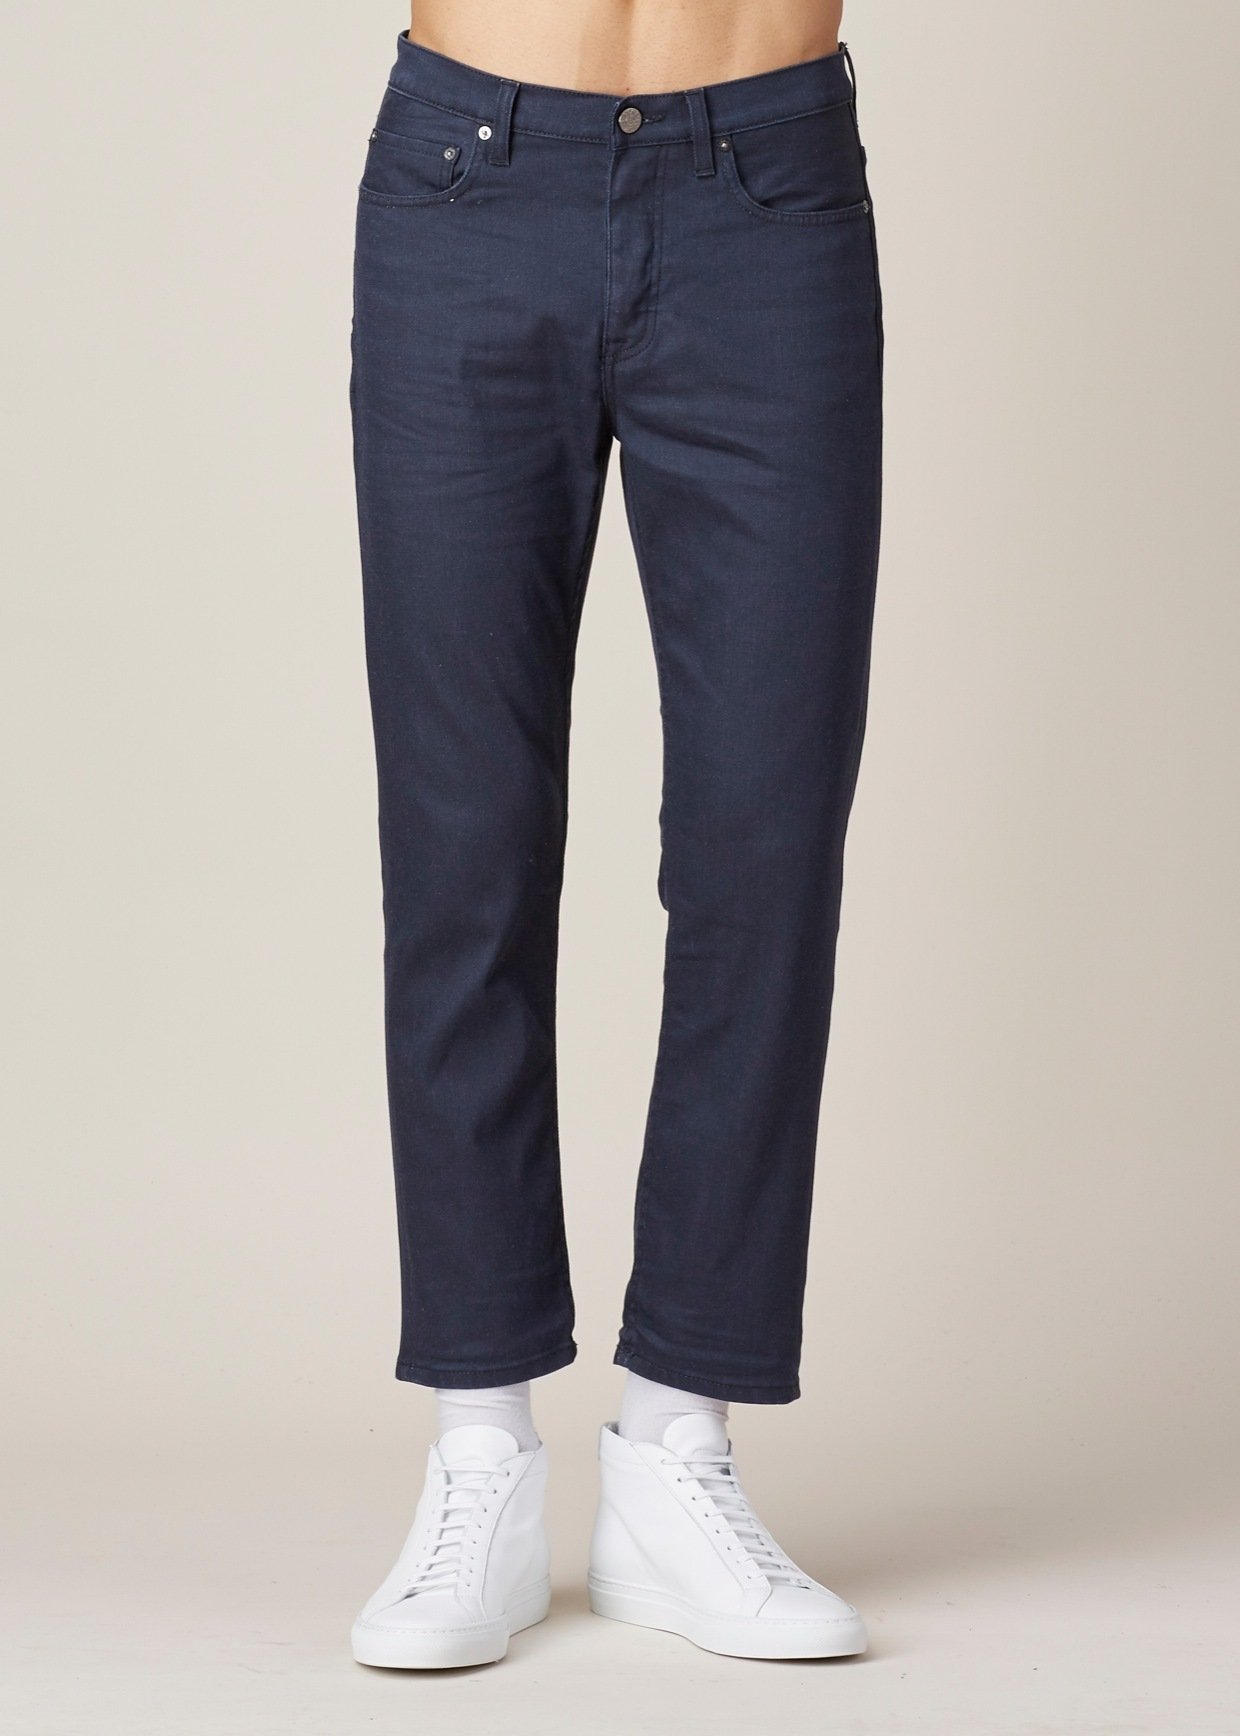 Lyst - Acne Studios Moon Town Jean in Blue for Men e49bd137edf